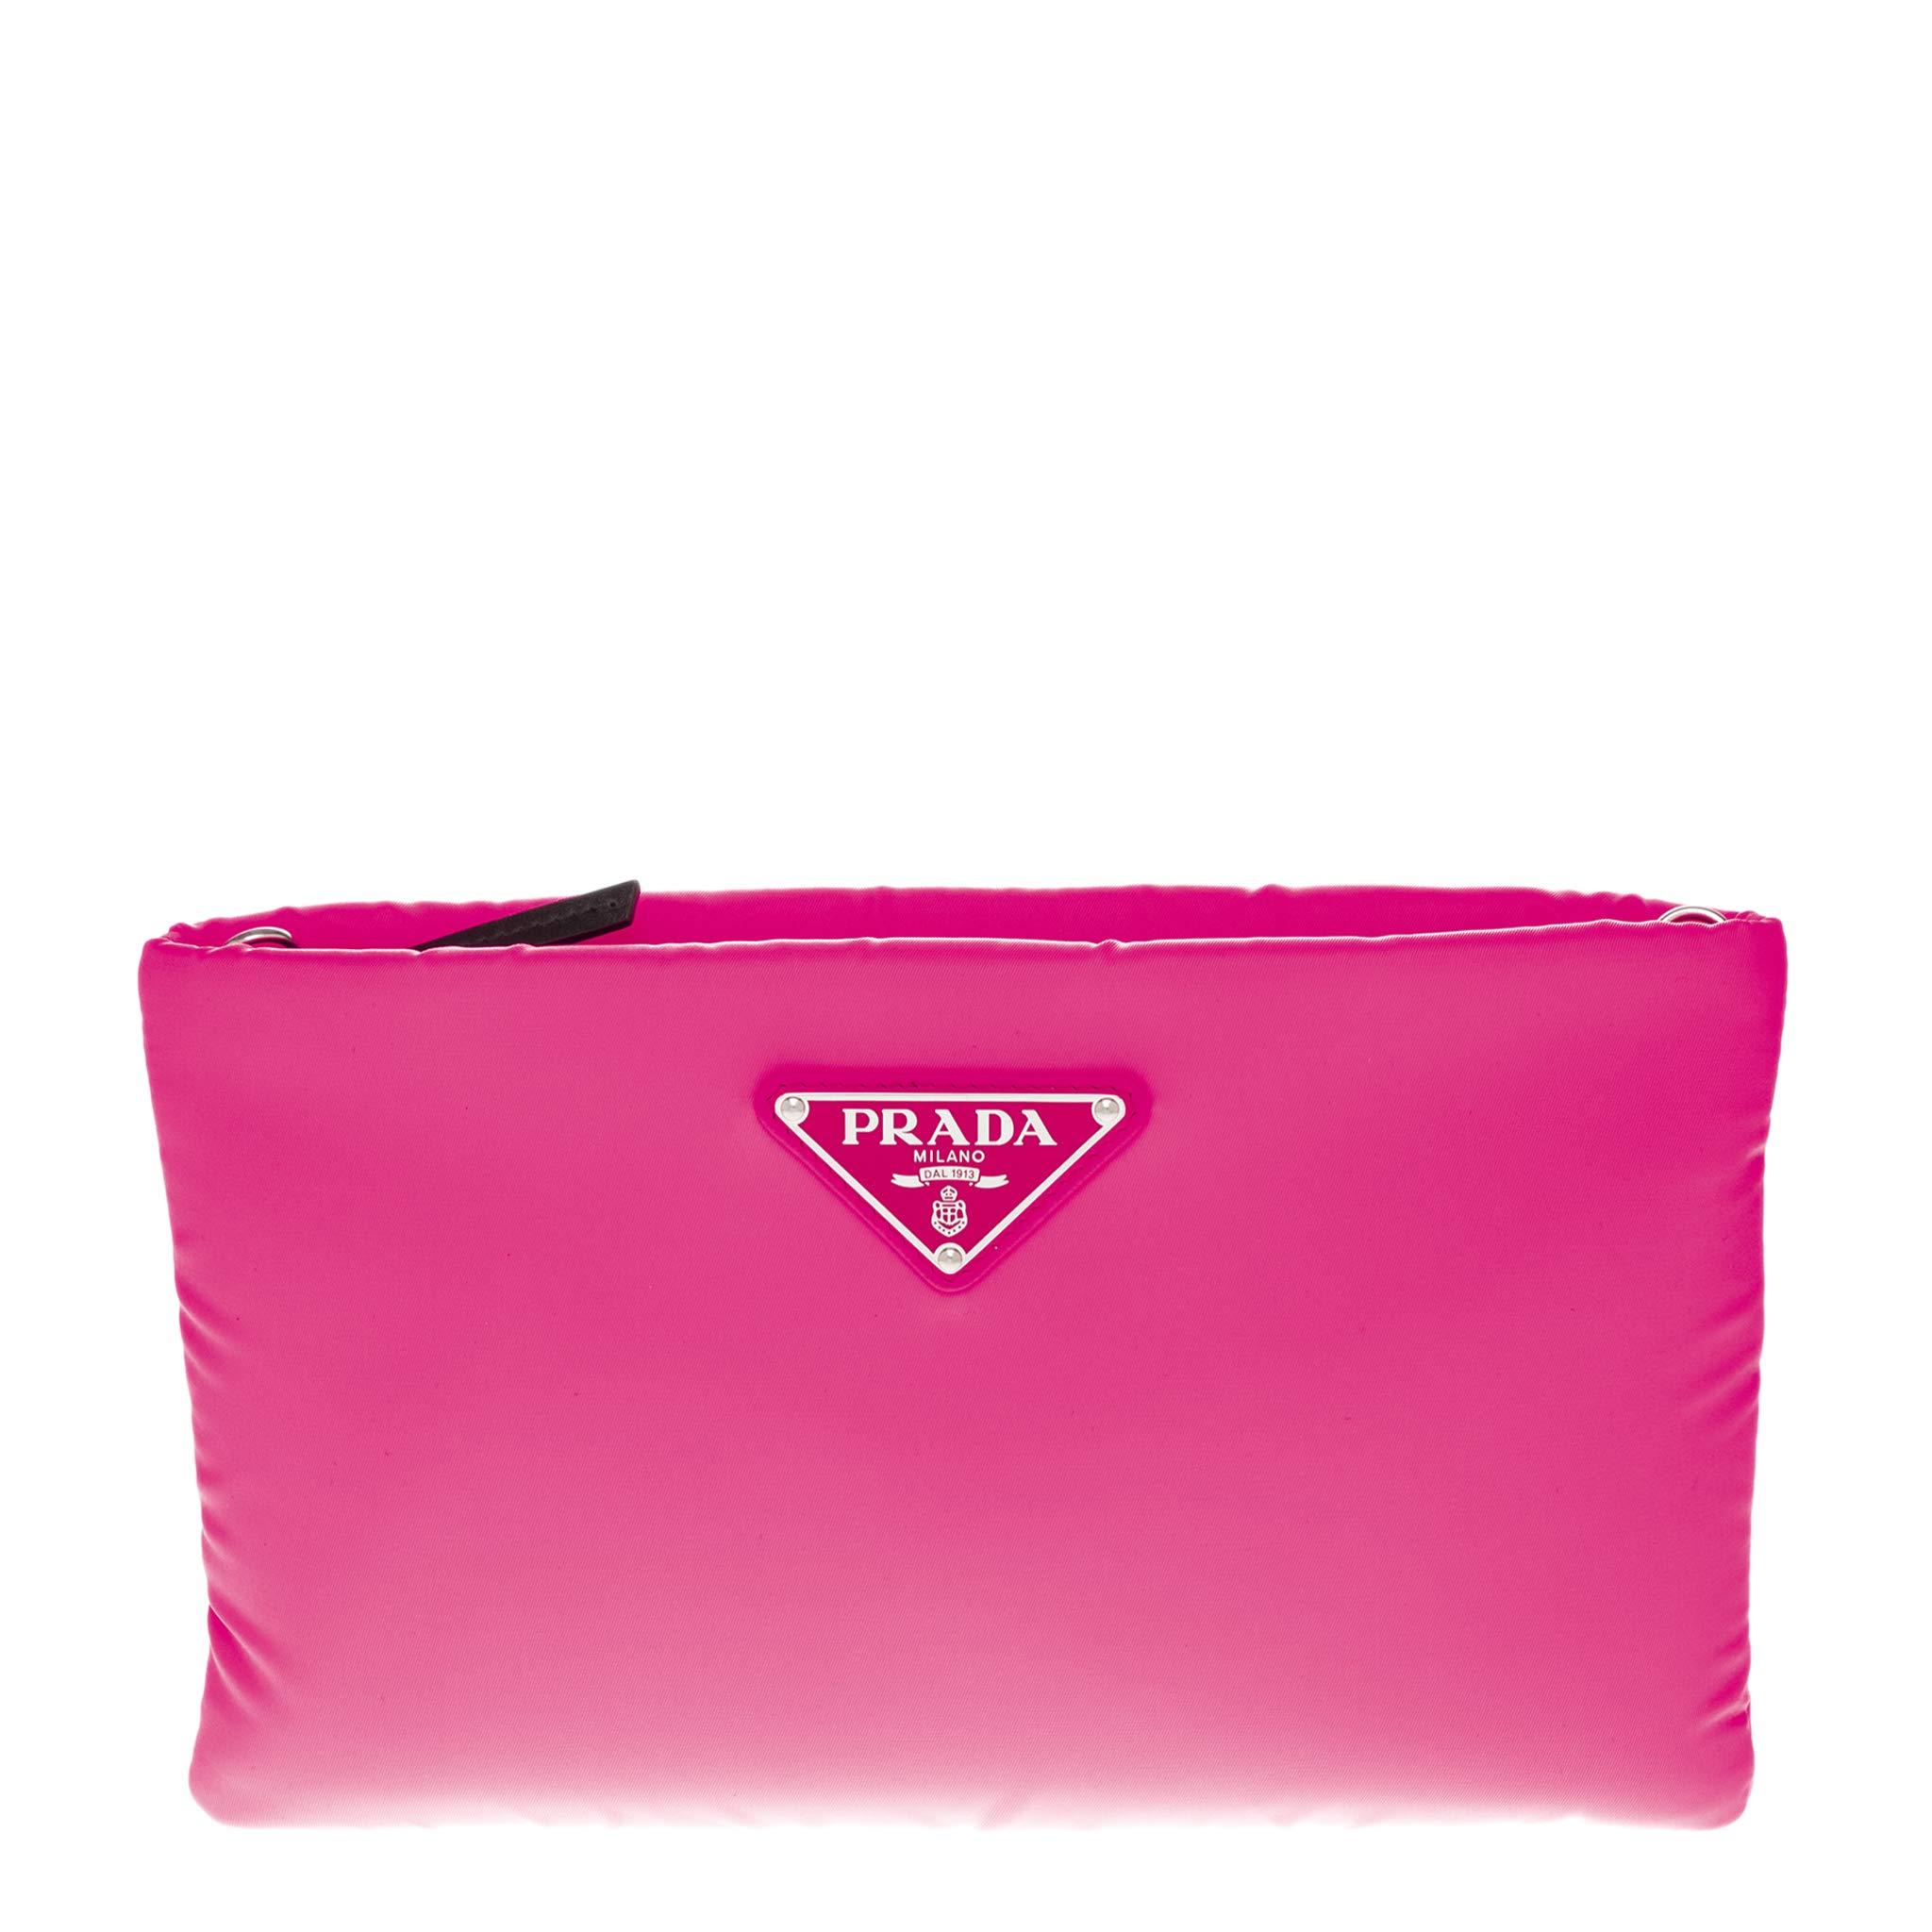 Prada Women's Small Padded Nylon Clutch Pink